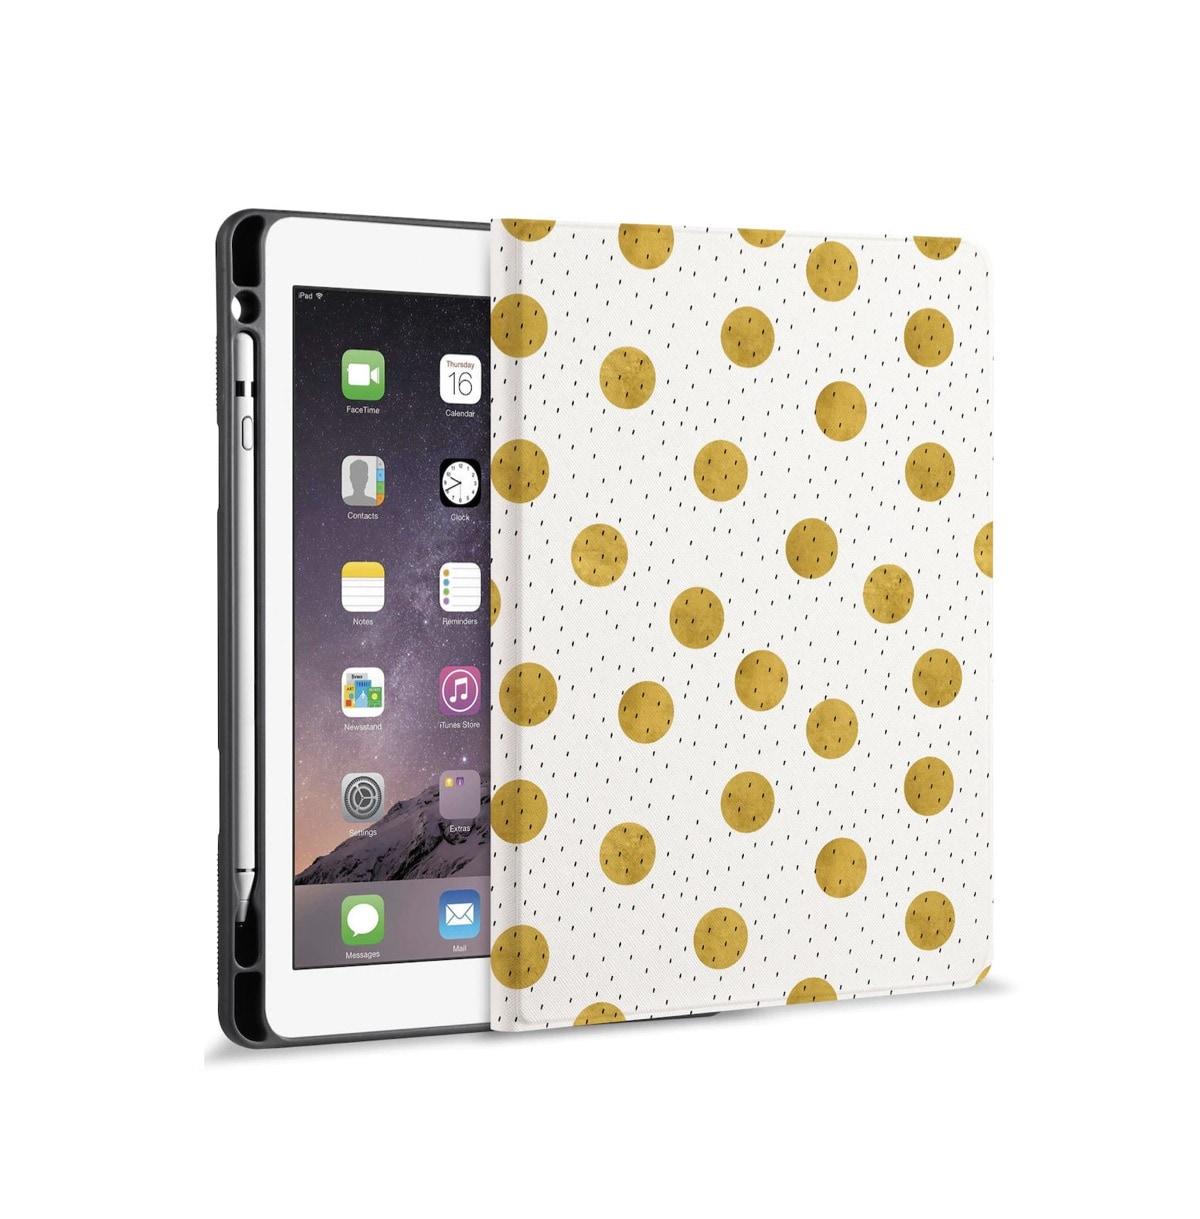 Cute Apple iPad 10.2 case cover with Apple Pencil holder - 2021 season